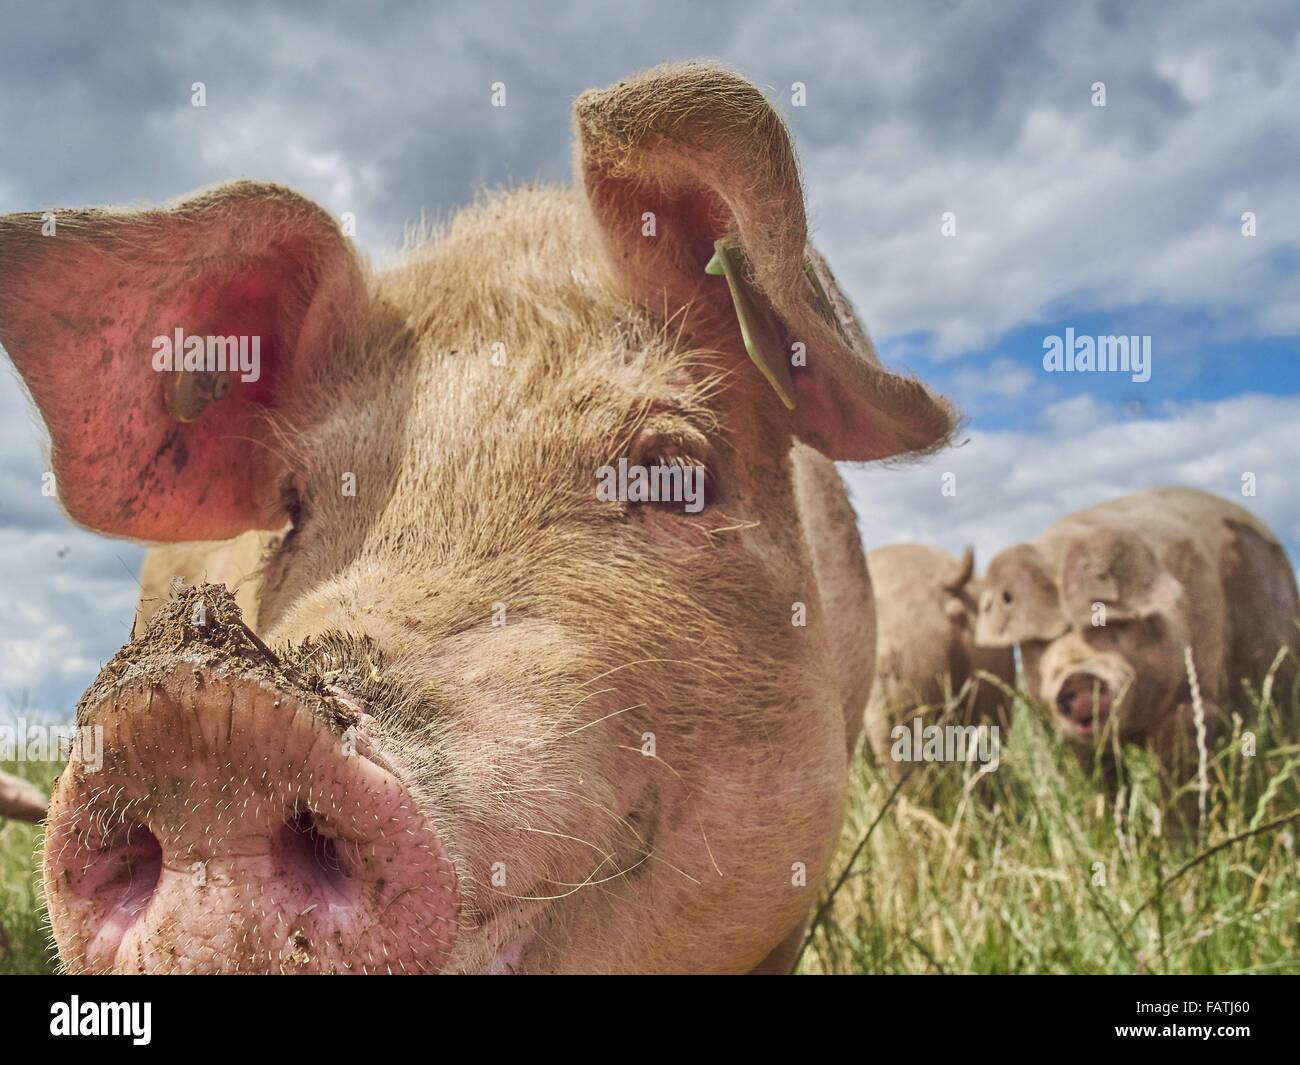 Close up Head shot of free range les porcs dans un champ d'herbe Photo Stock